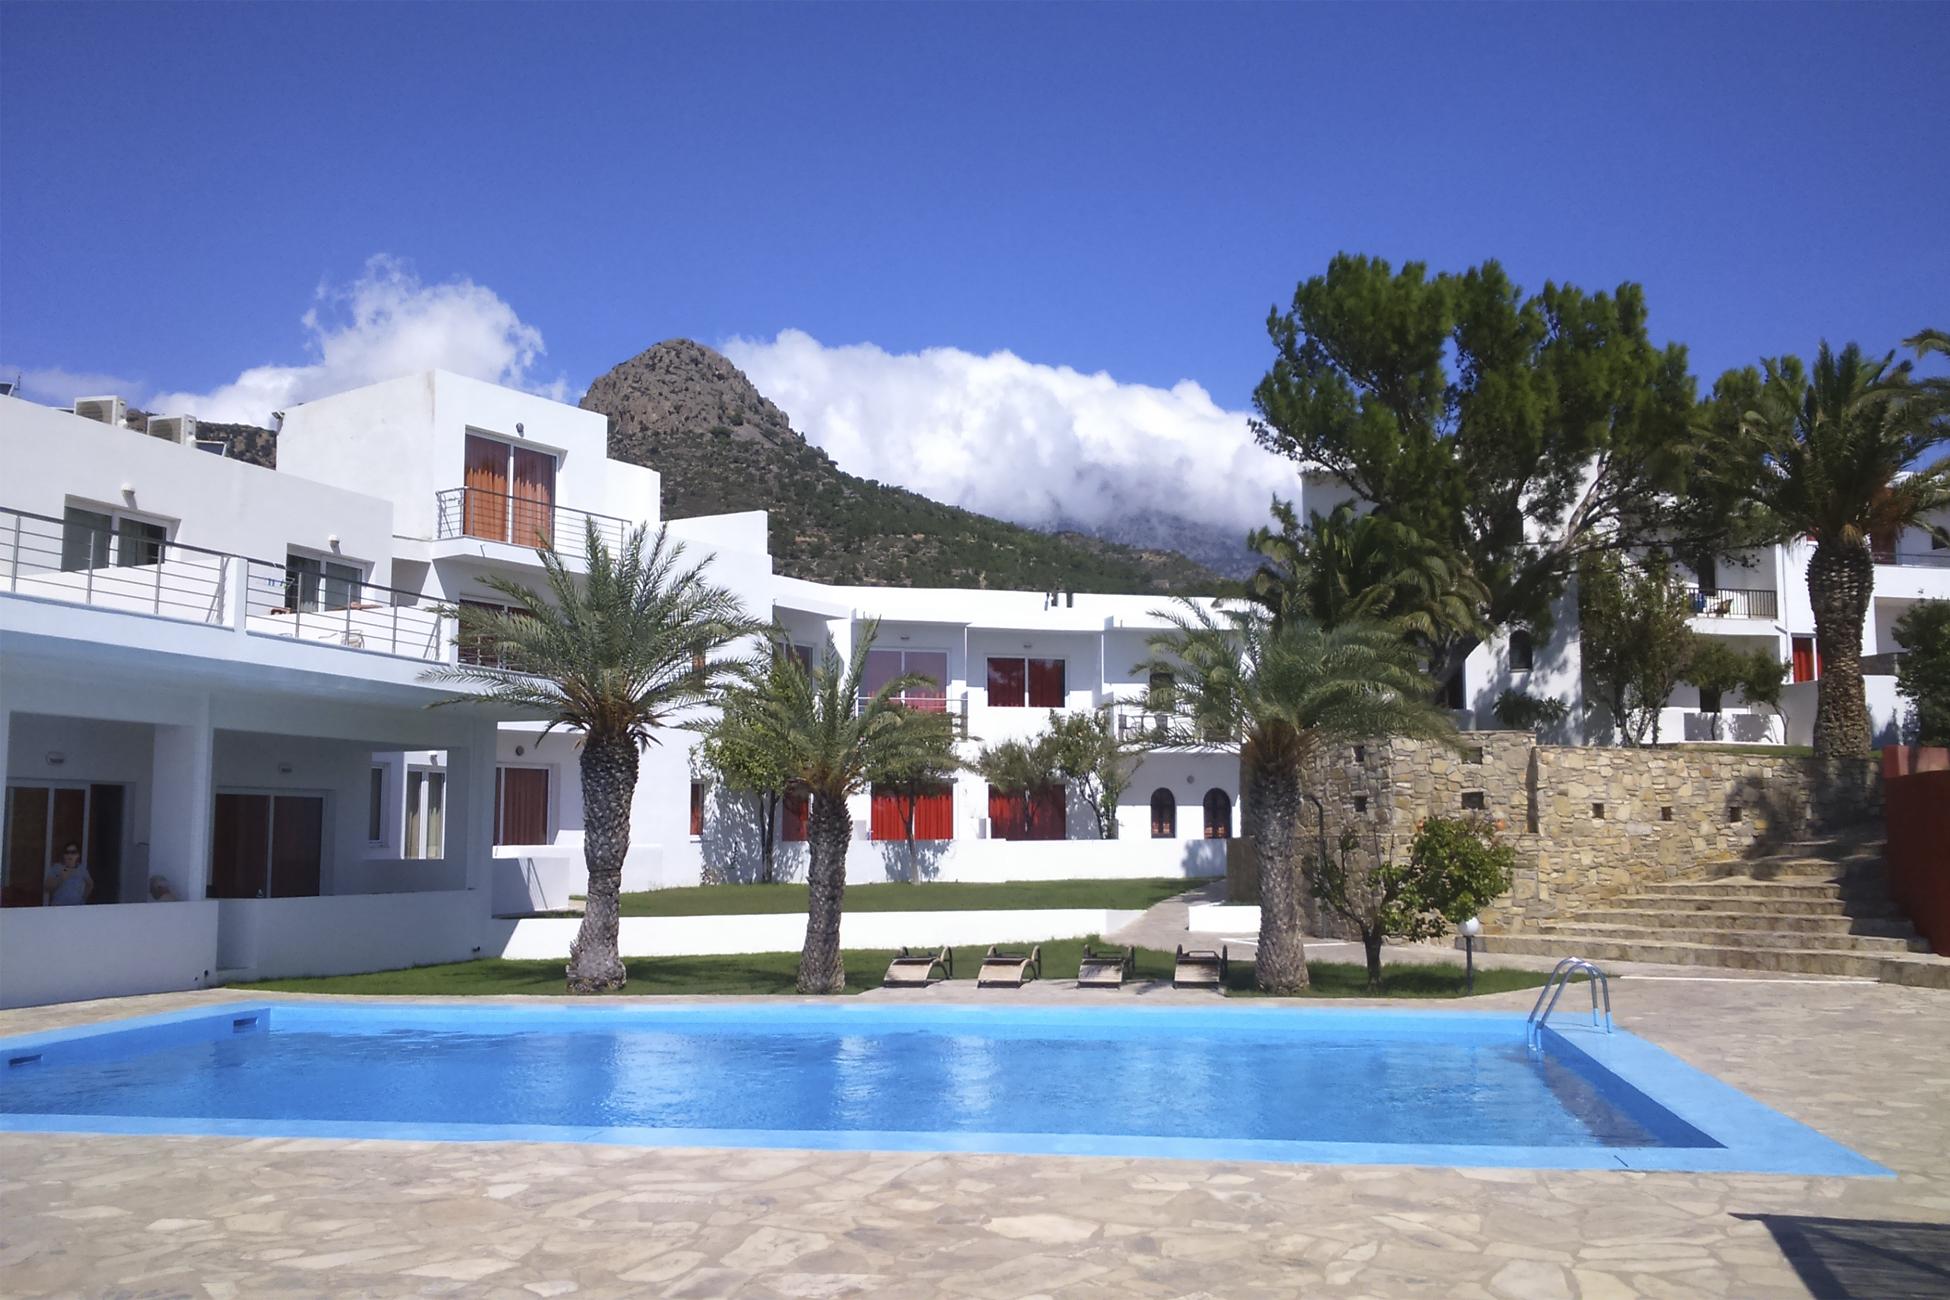 Kreta Hotel 2